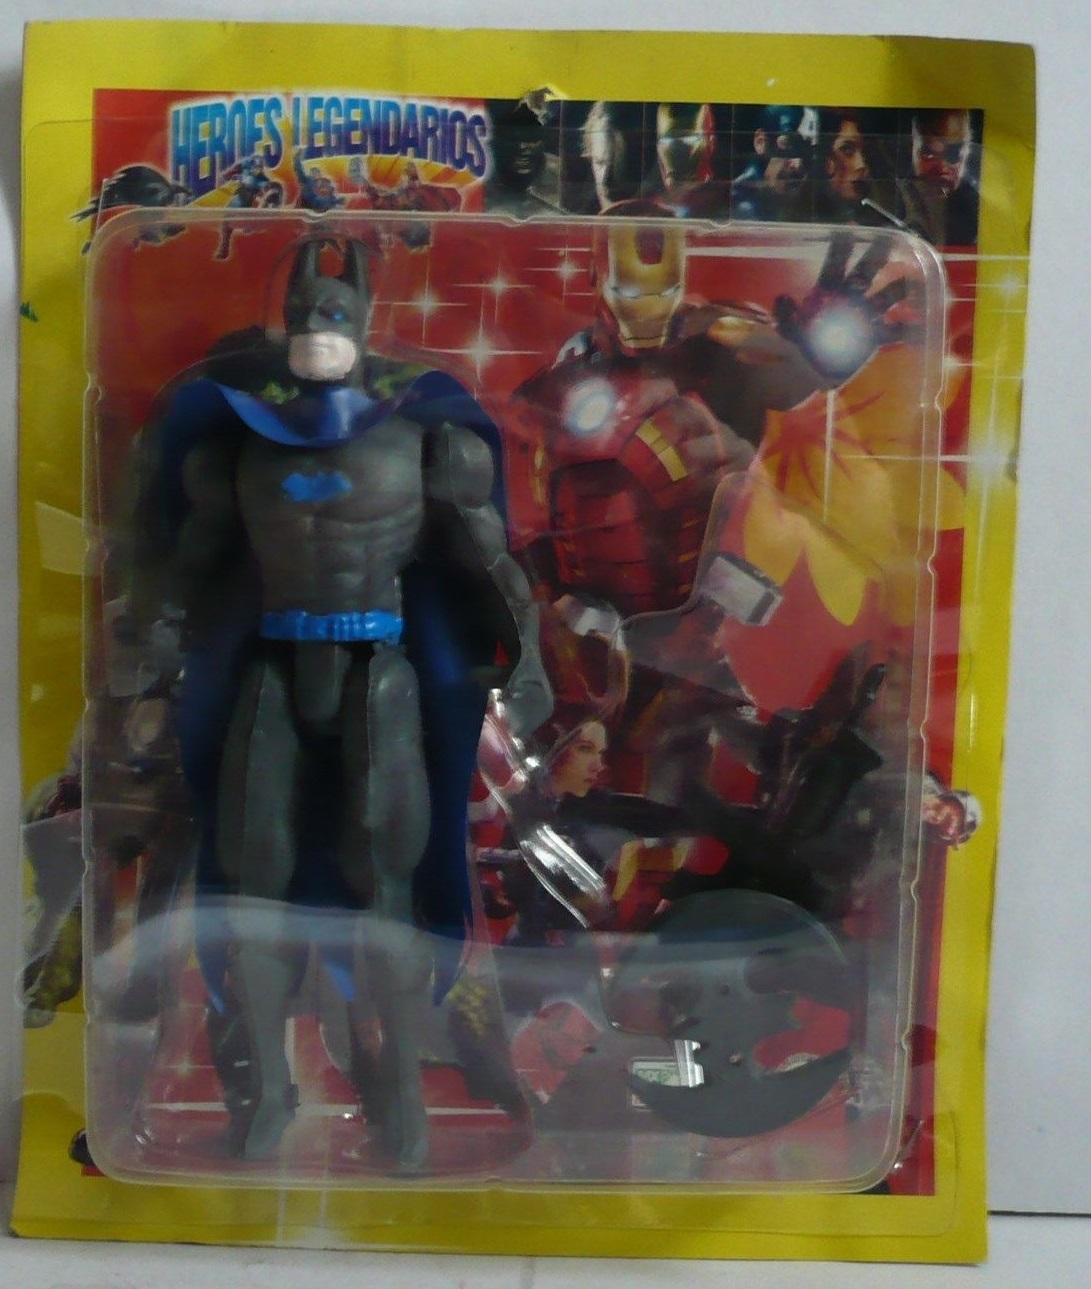 Batman (Legendary Heroes figure)